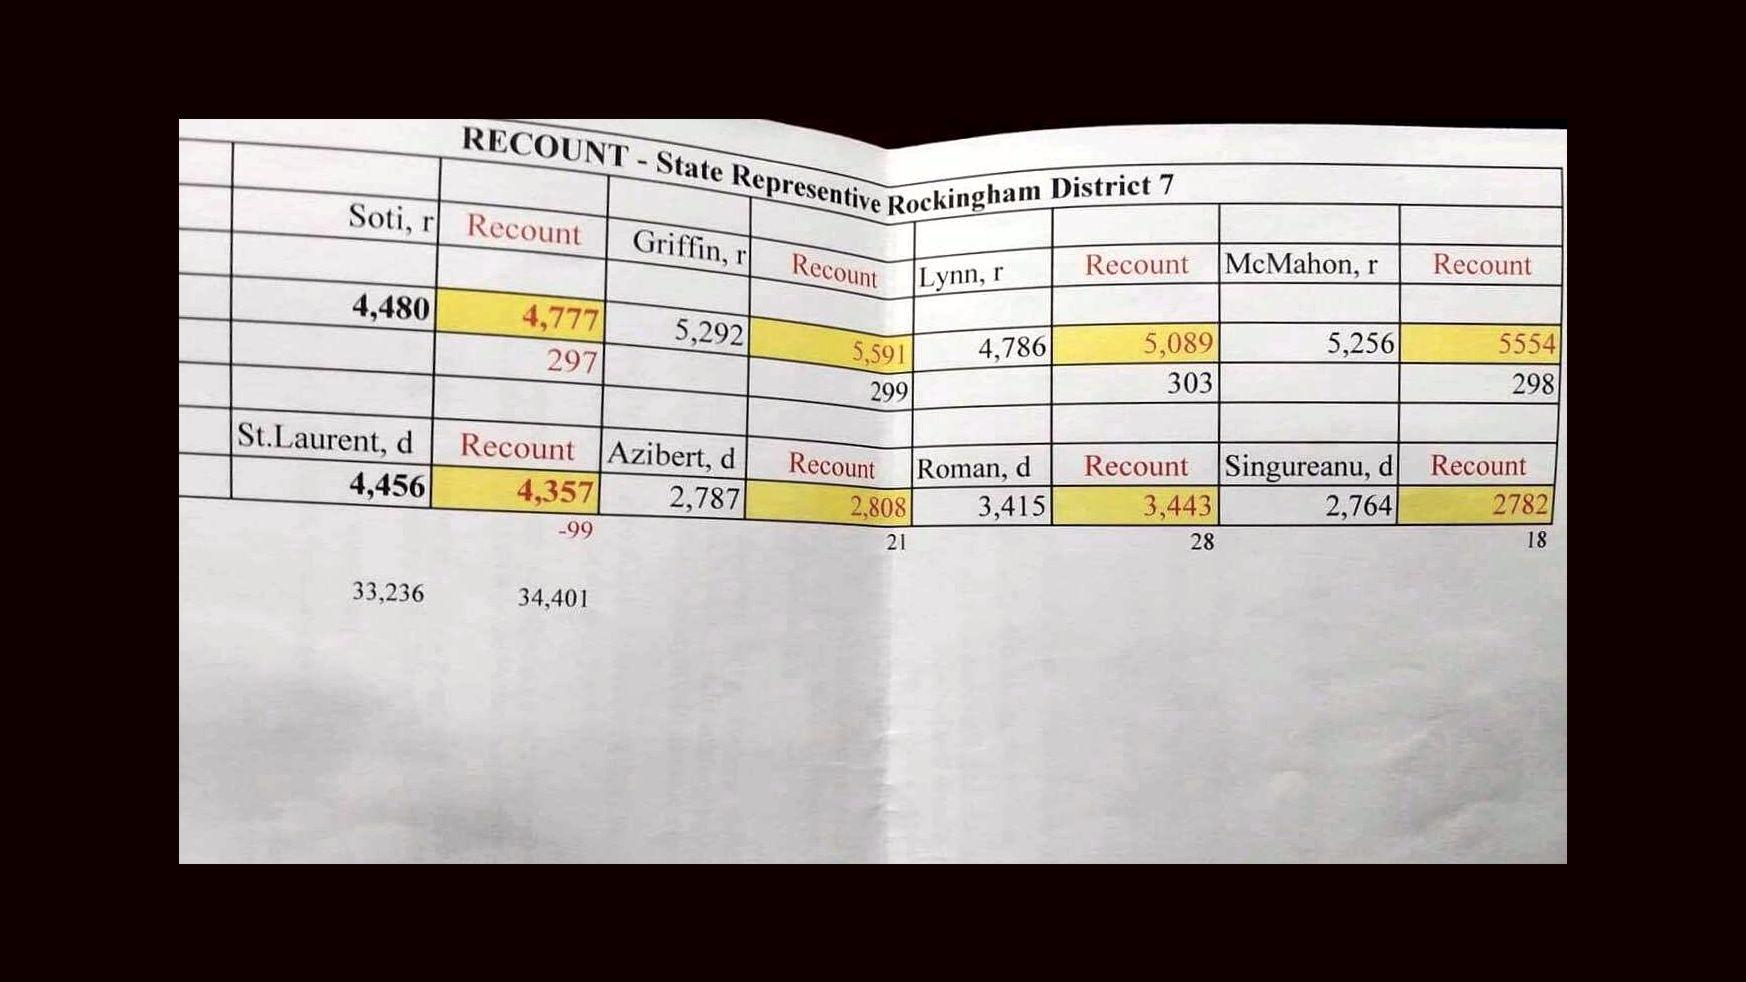 Recount - State Representative Rockingham District 7